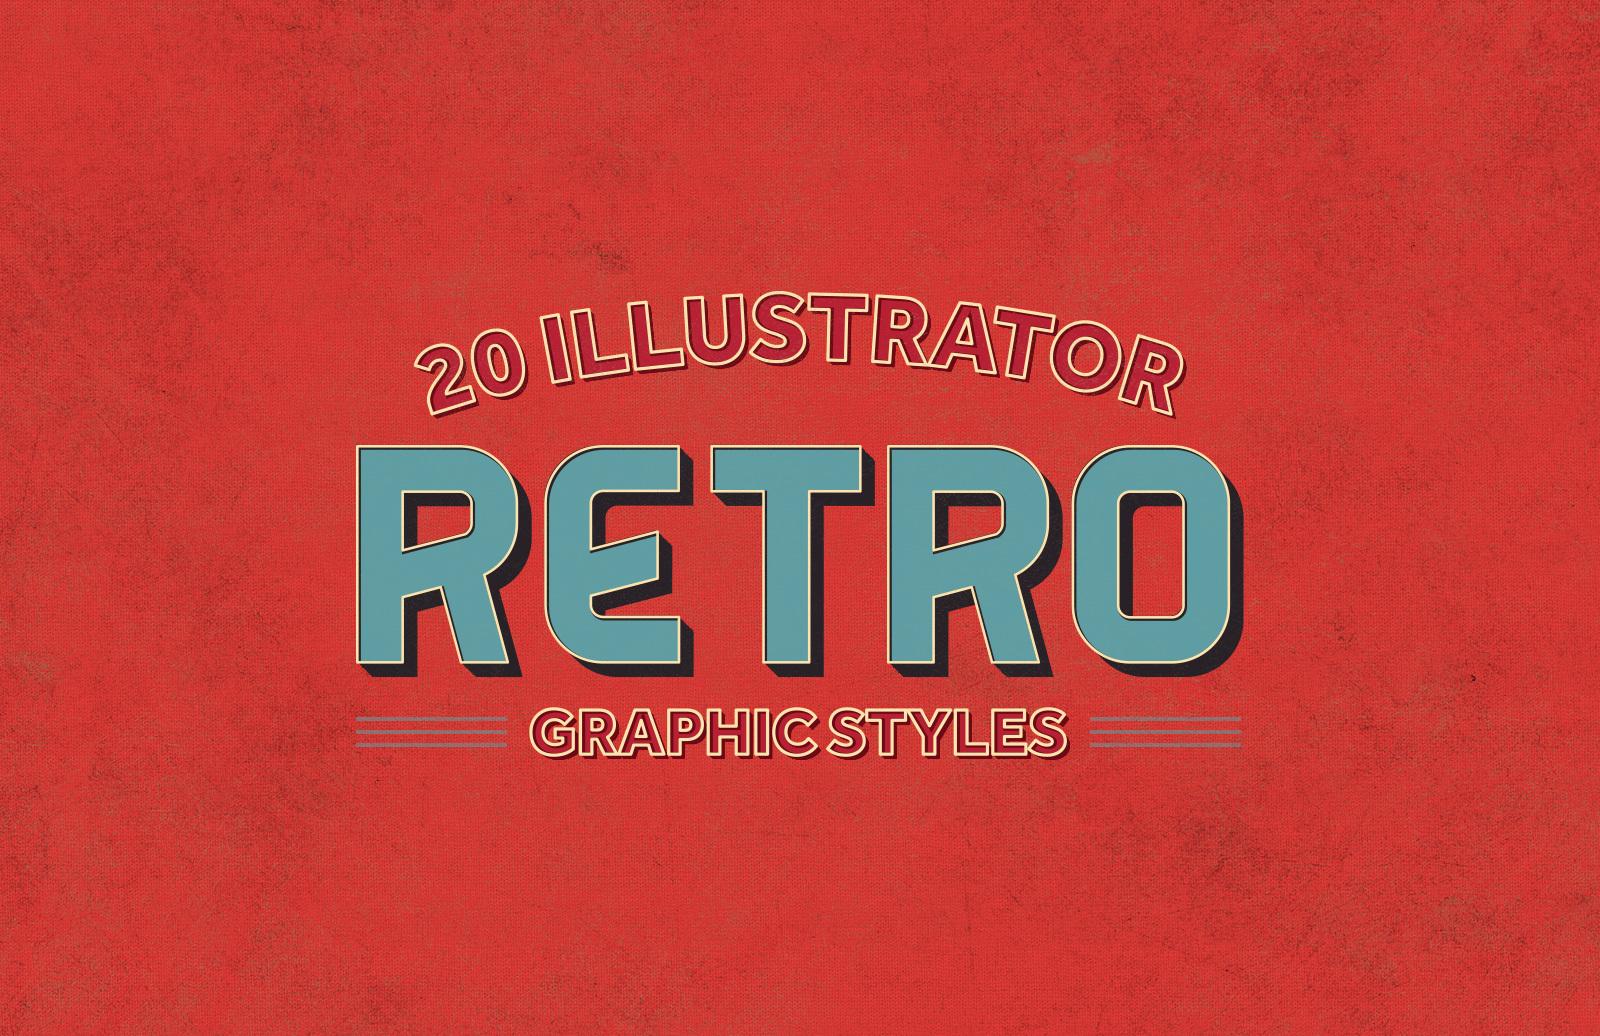 20 Illustrator Retro Graphic Styles